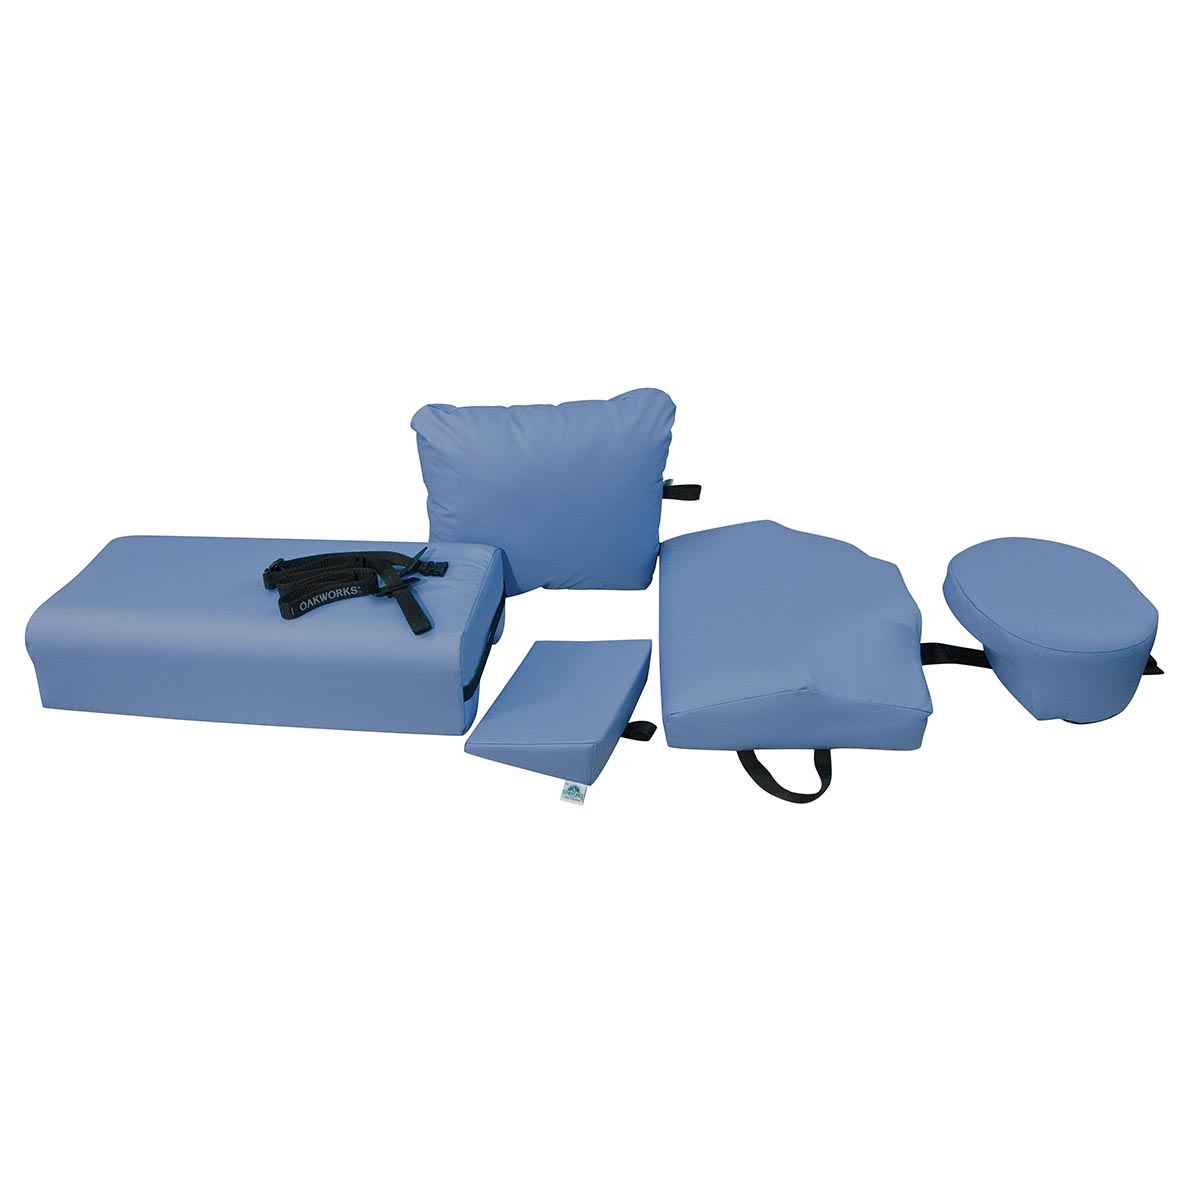 Oakworks Side Lying Positioning System Pillows Amp Bolsters